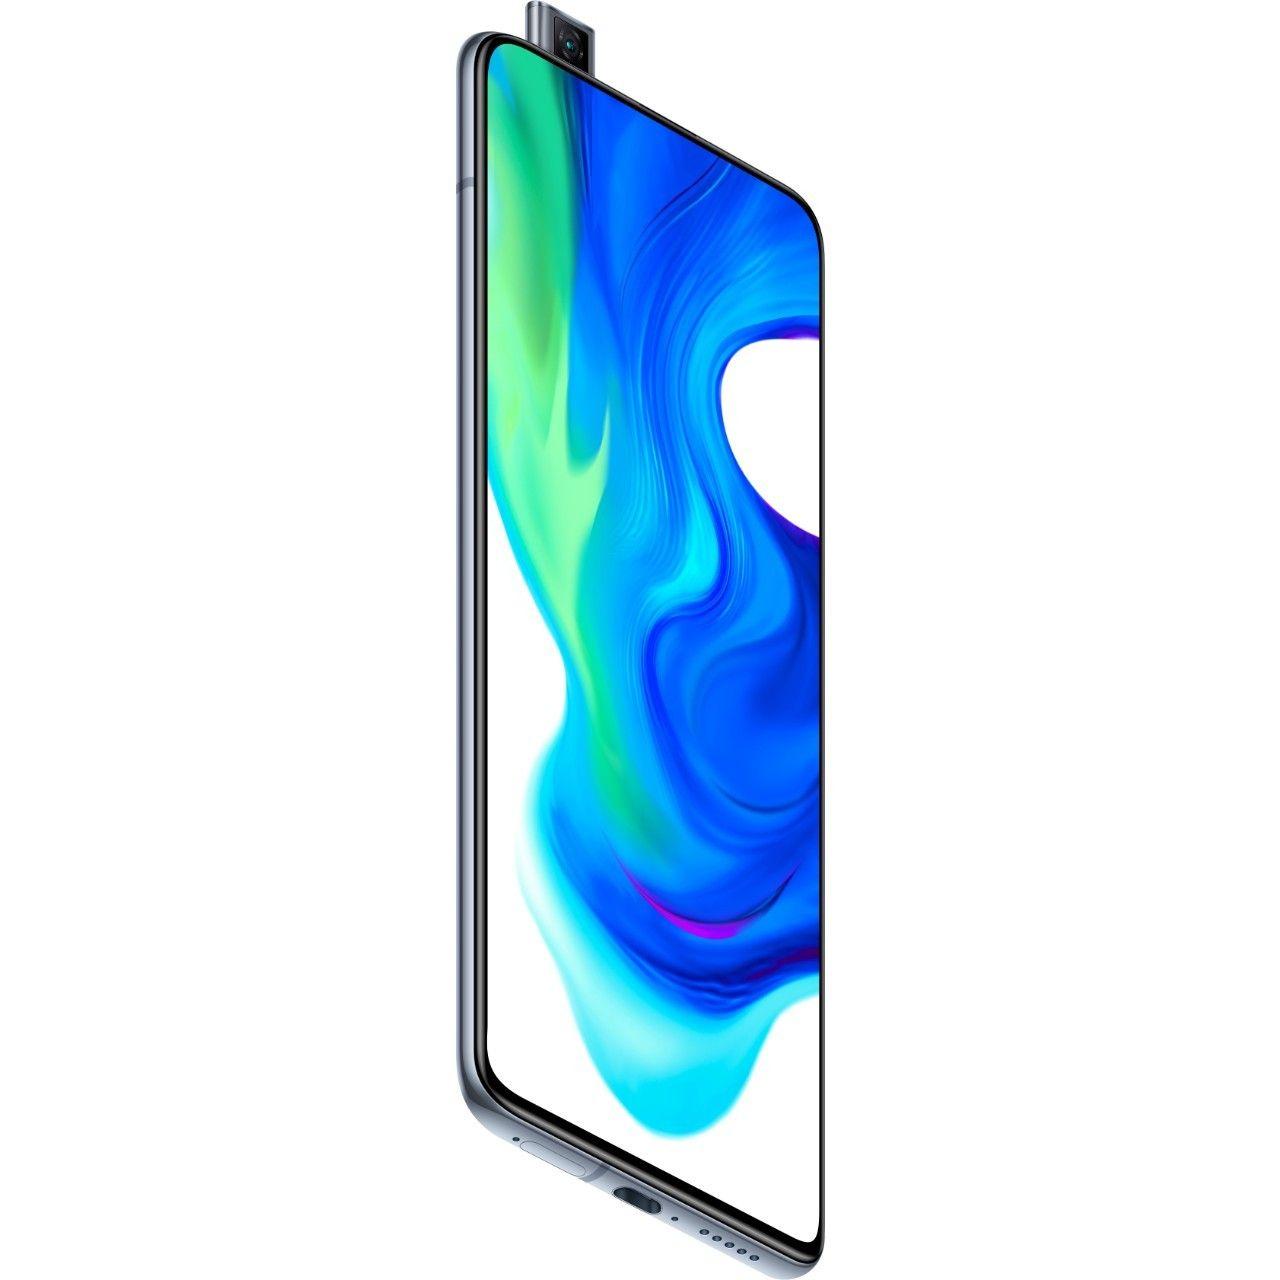 "Smartphone 6.67"" Poco F2 Pro - Full HD+ AMOLED, Snapdragon 865, RAM 6 Go, RAM, 128 Go, LiquidCool 2.0, Coloris au choix (Entrepôt Espagne)"